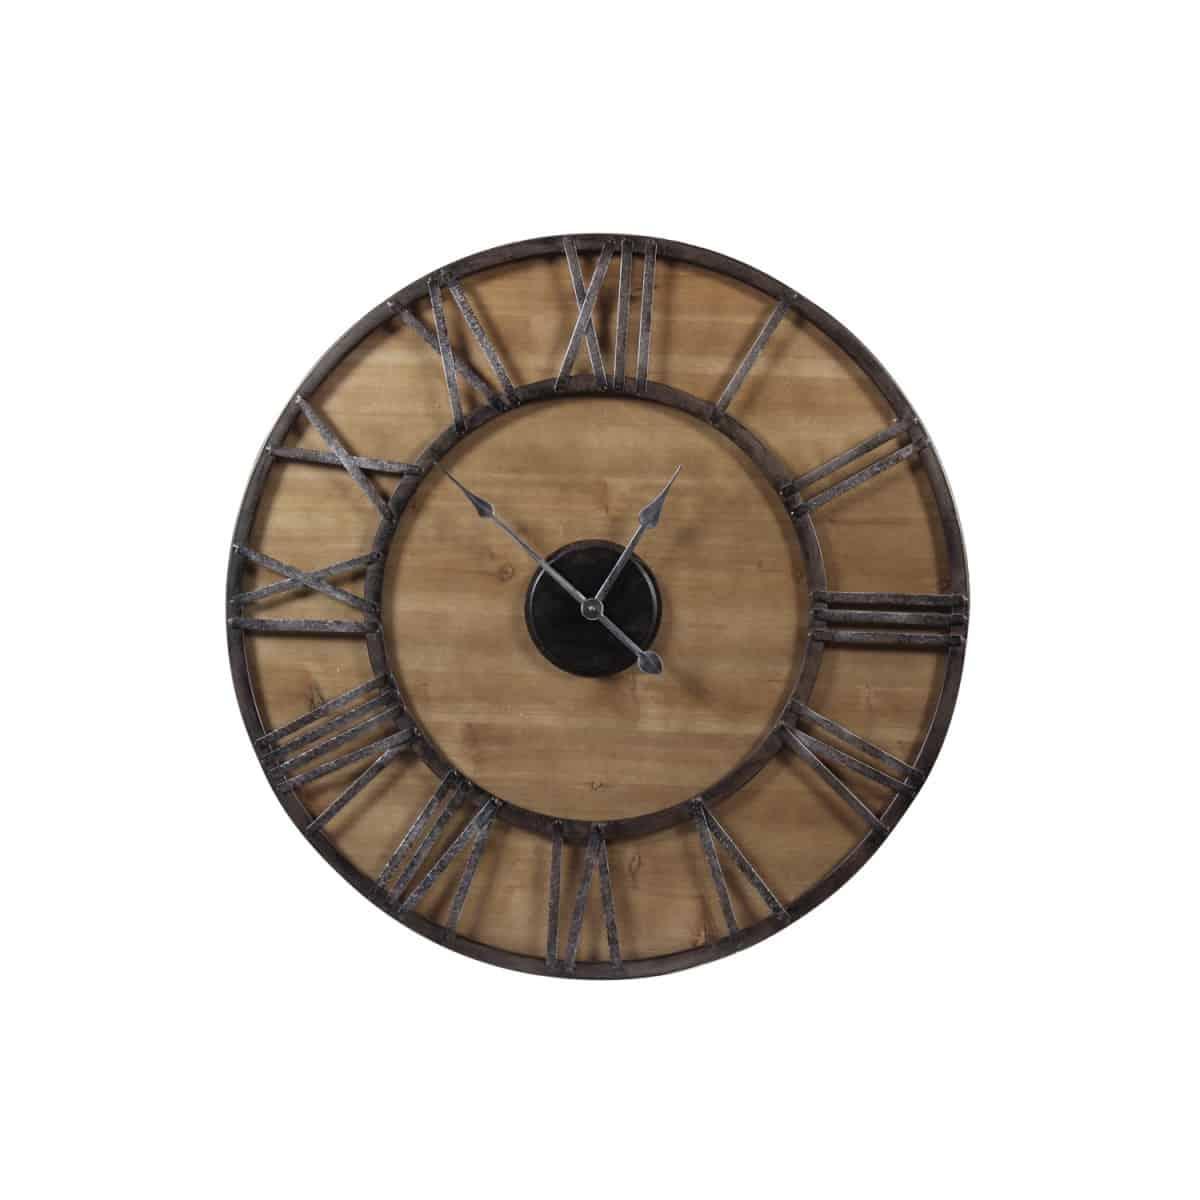 Grande Horloge Ancienne Fer Forgé Bois 80cm - Noir